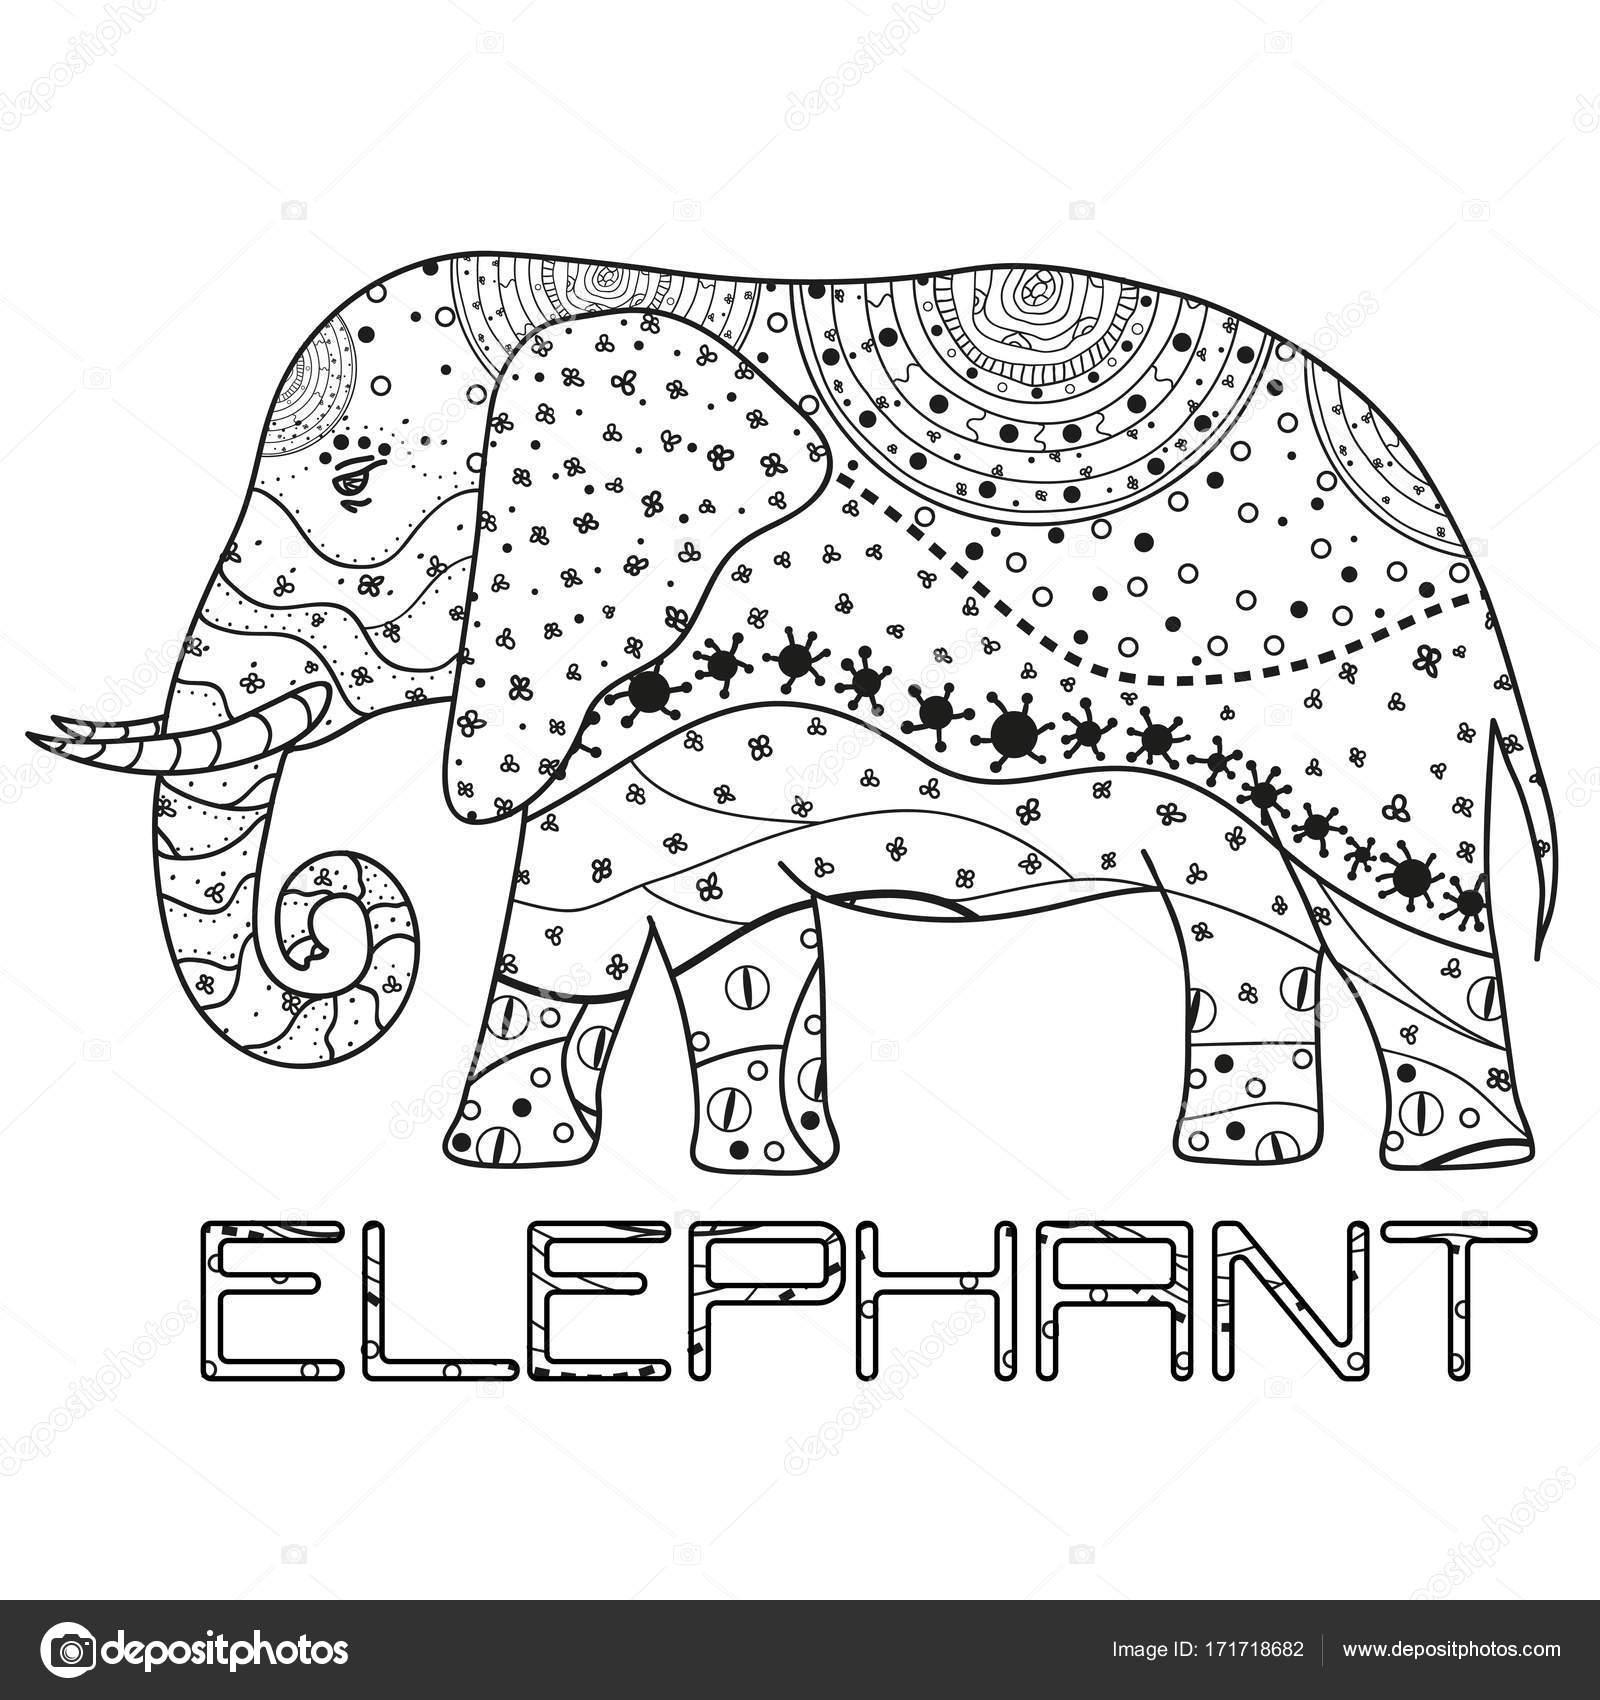 Elefant Zen Kunst Stockfoto C Mikabesfamilnaya 171718682